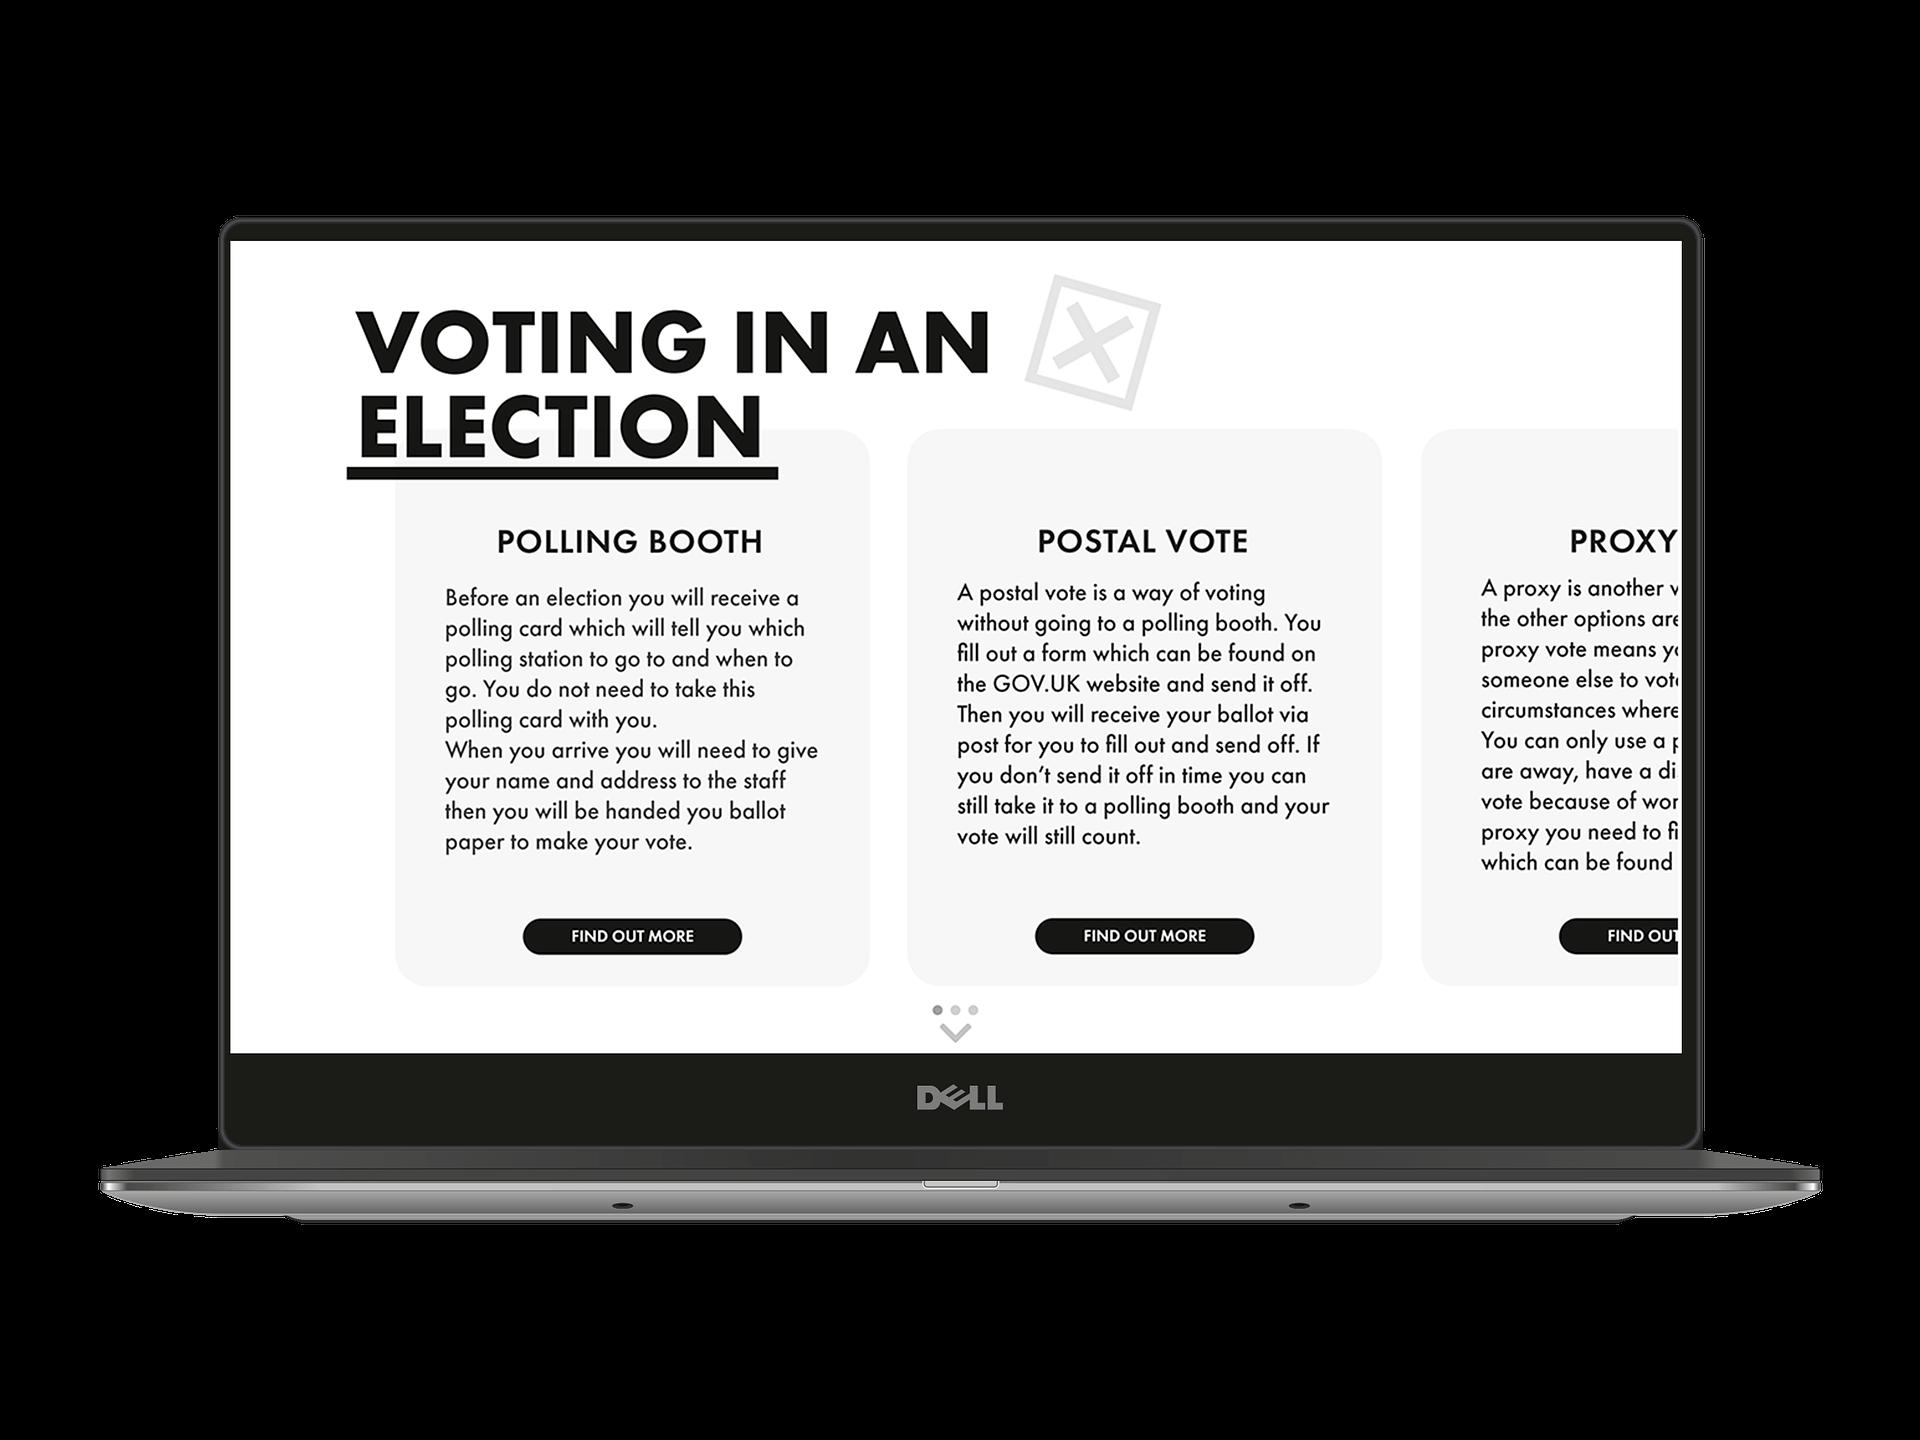 VotingINanElection.png